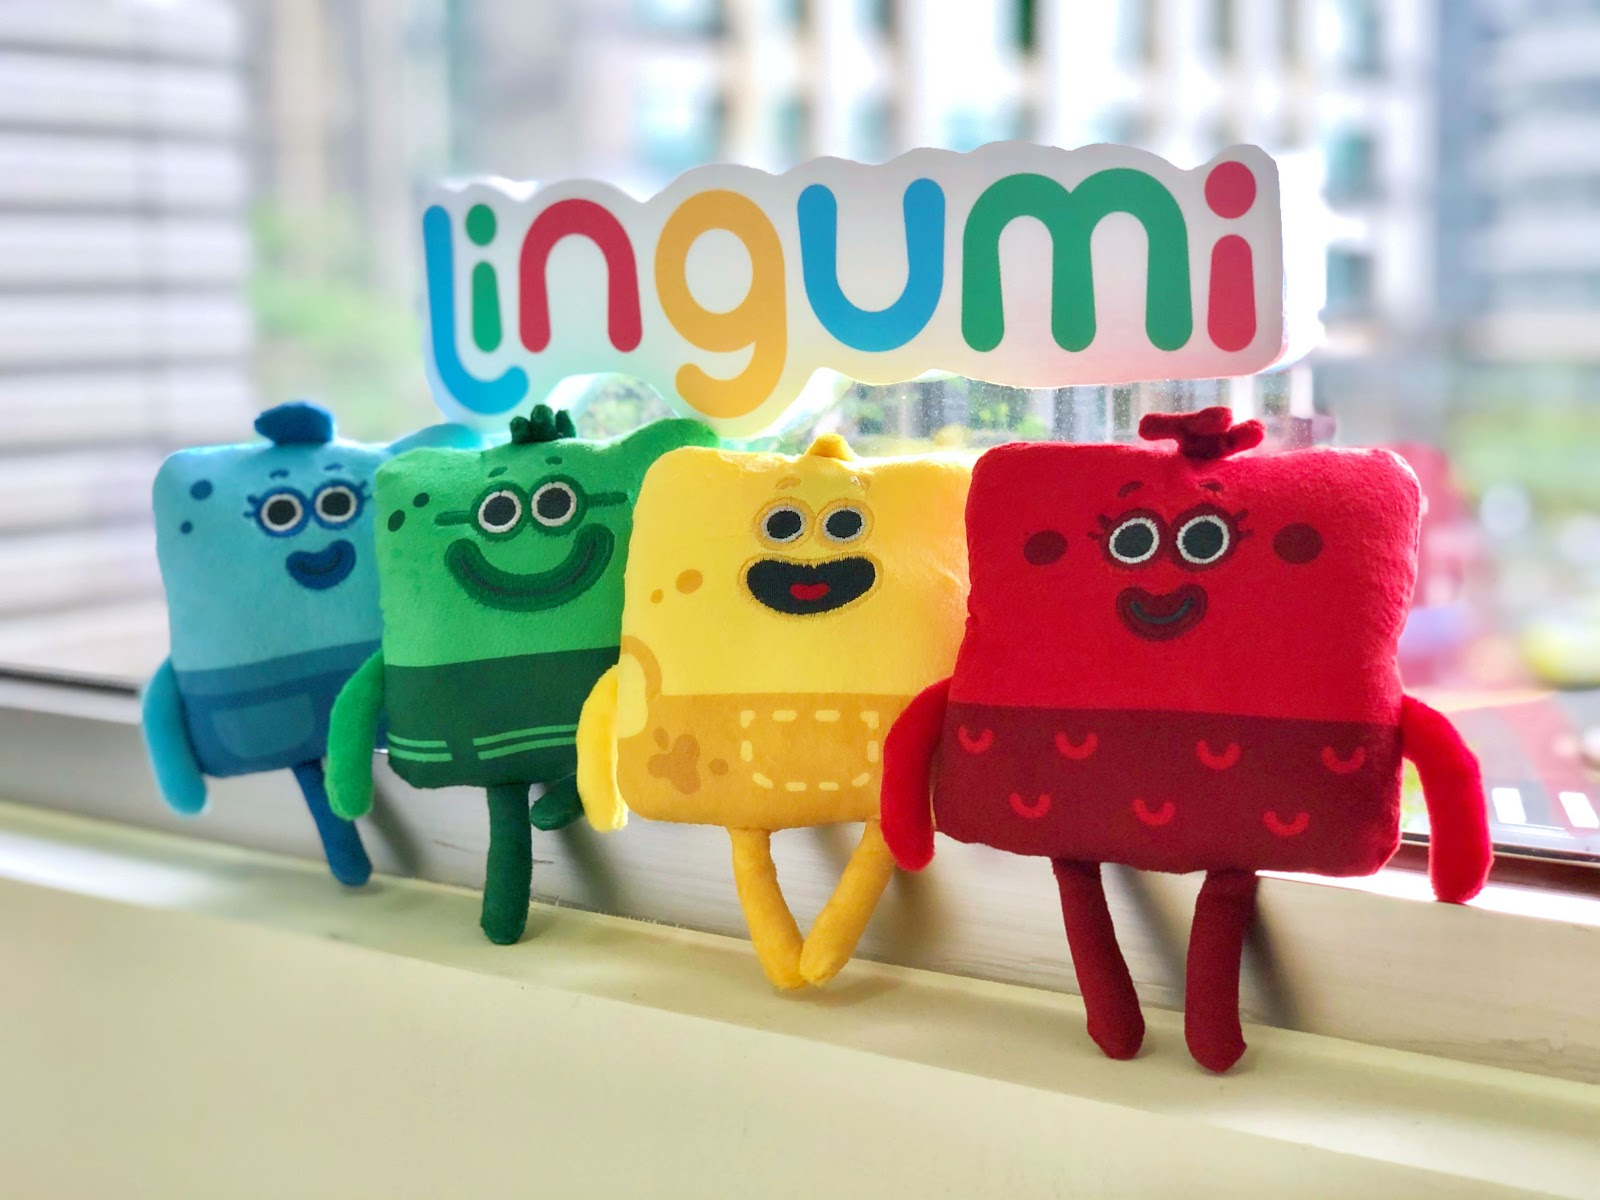 Lingumi 娃娃